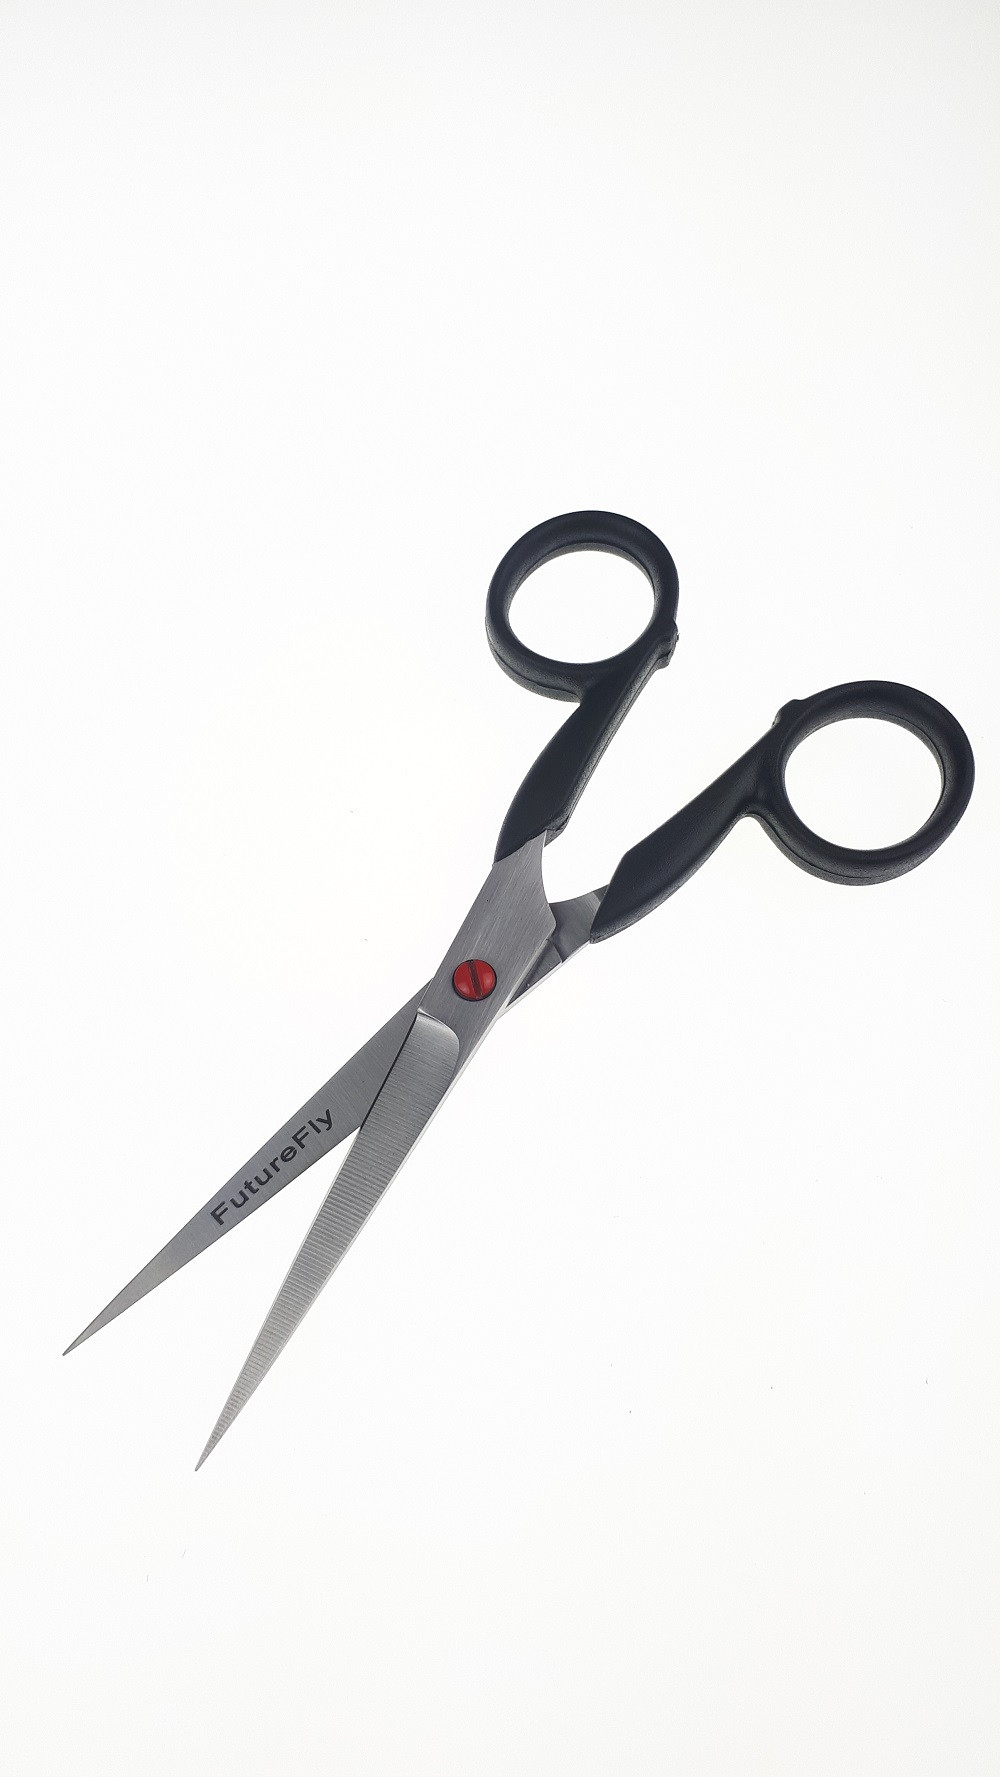 FF Predator Scissors